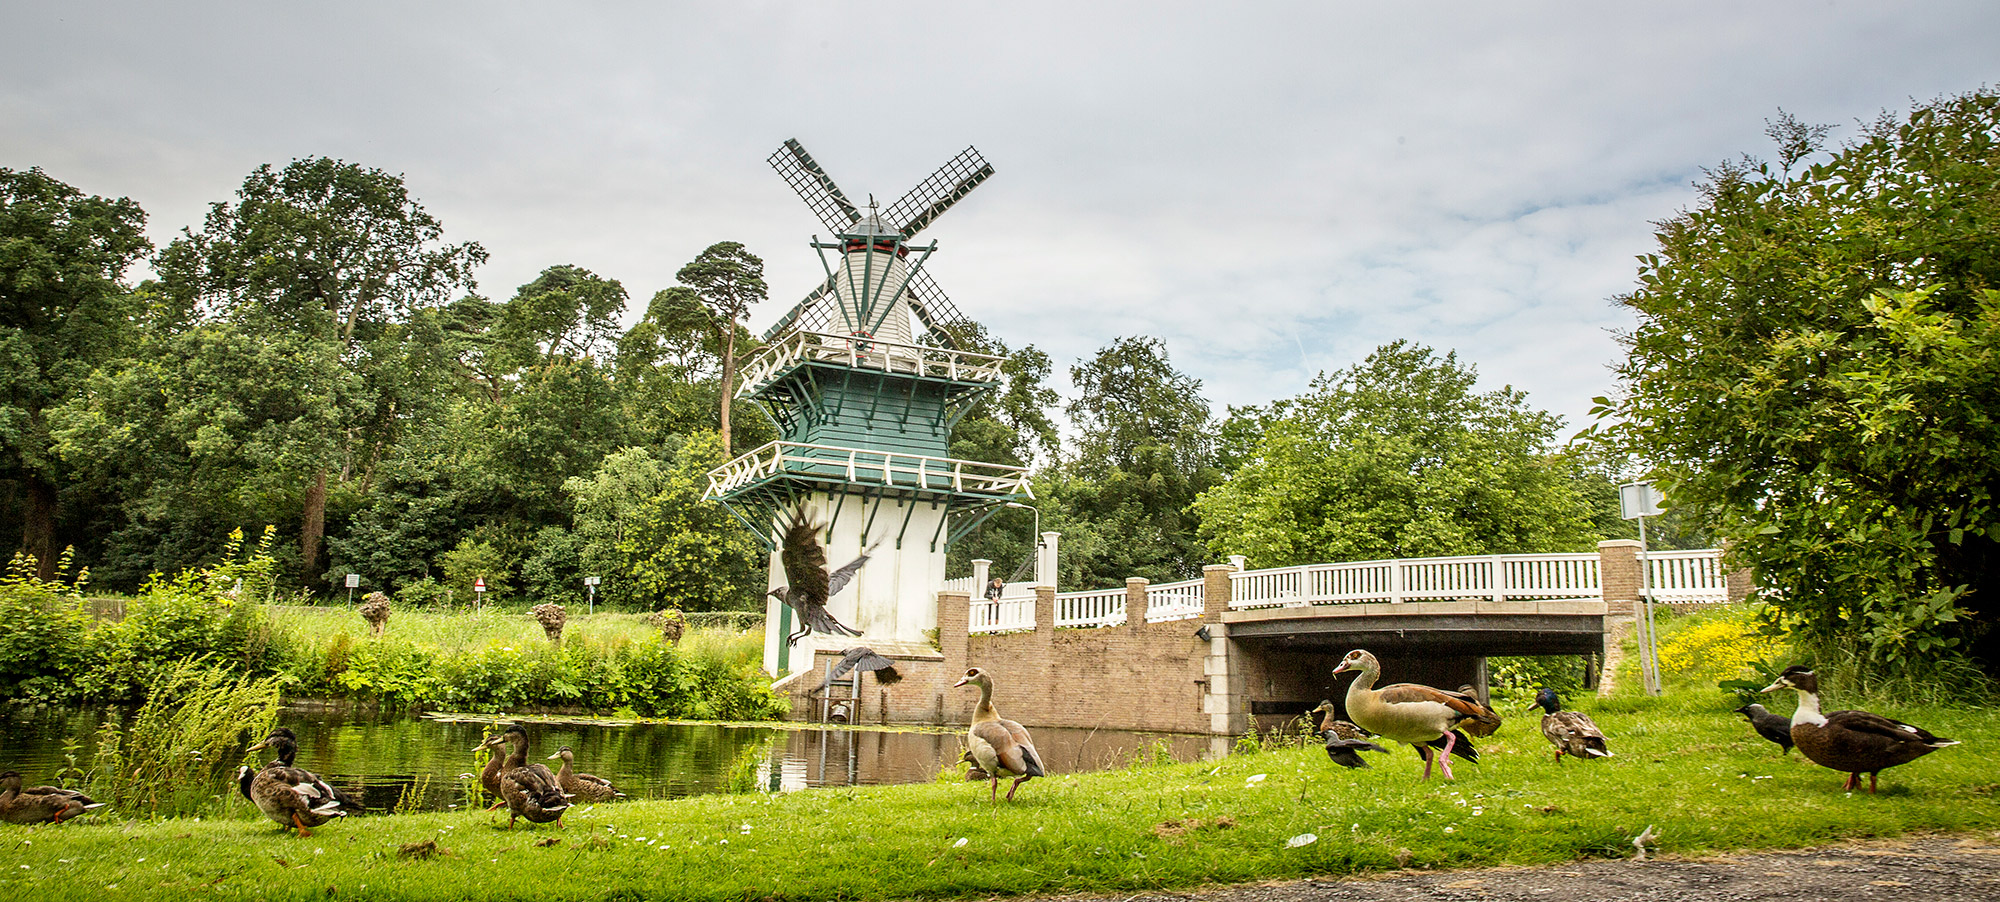 fotografie cursus workshop Groenendaal Heemstede